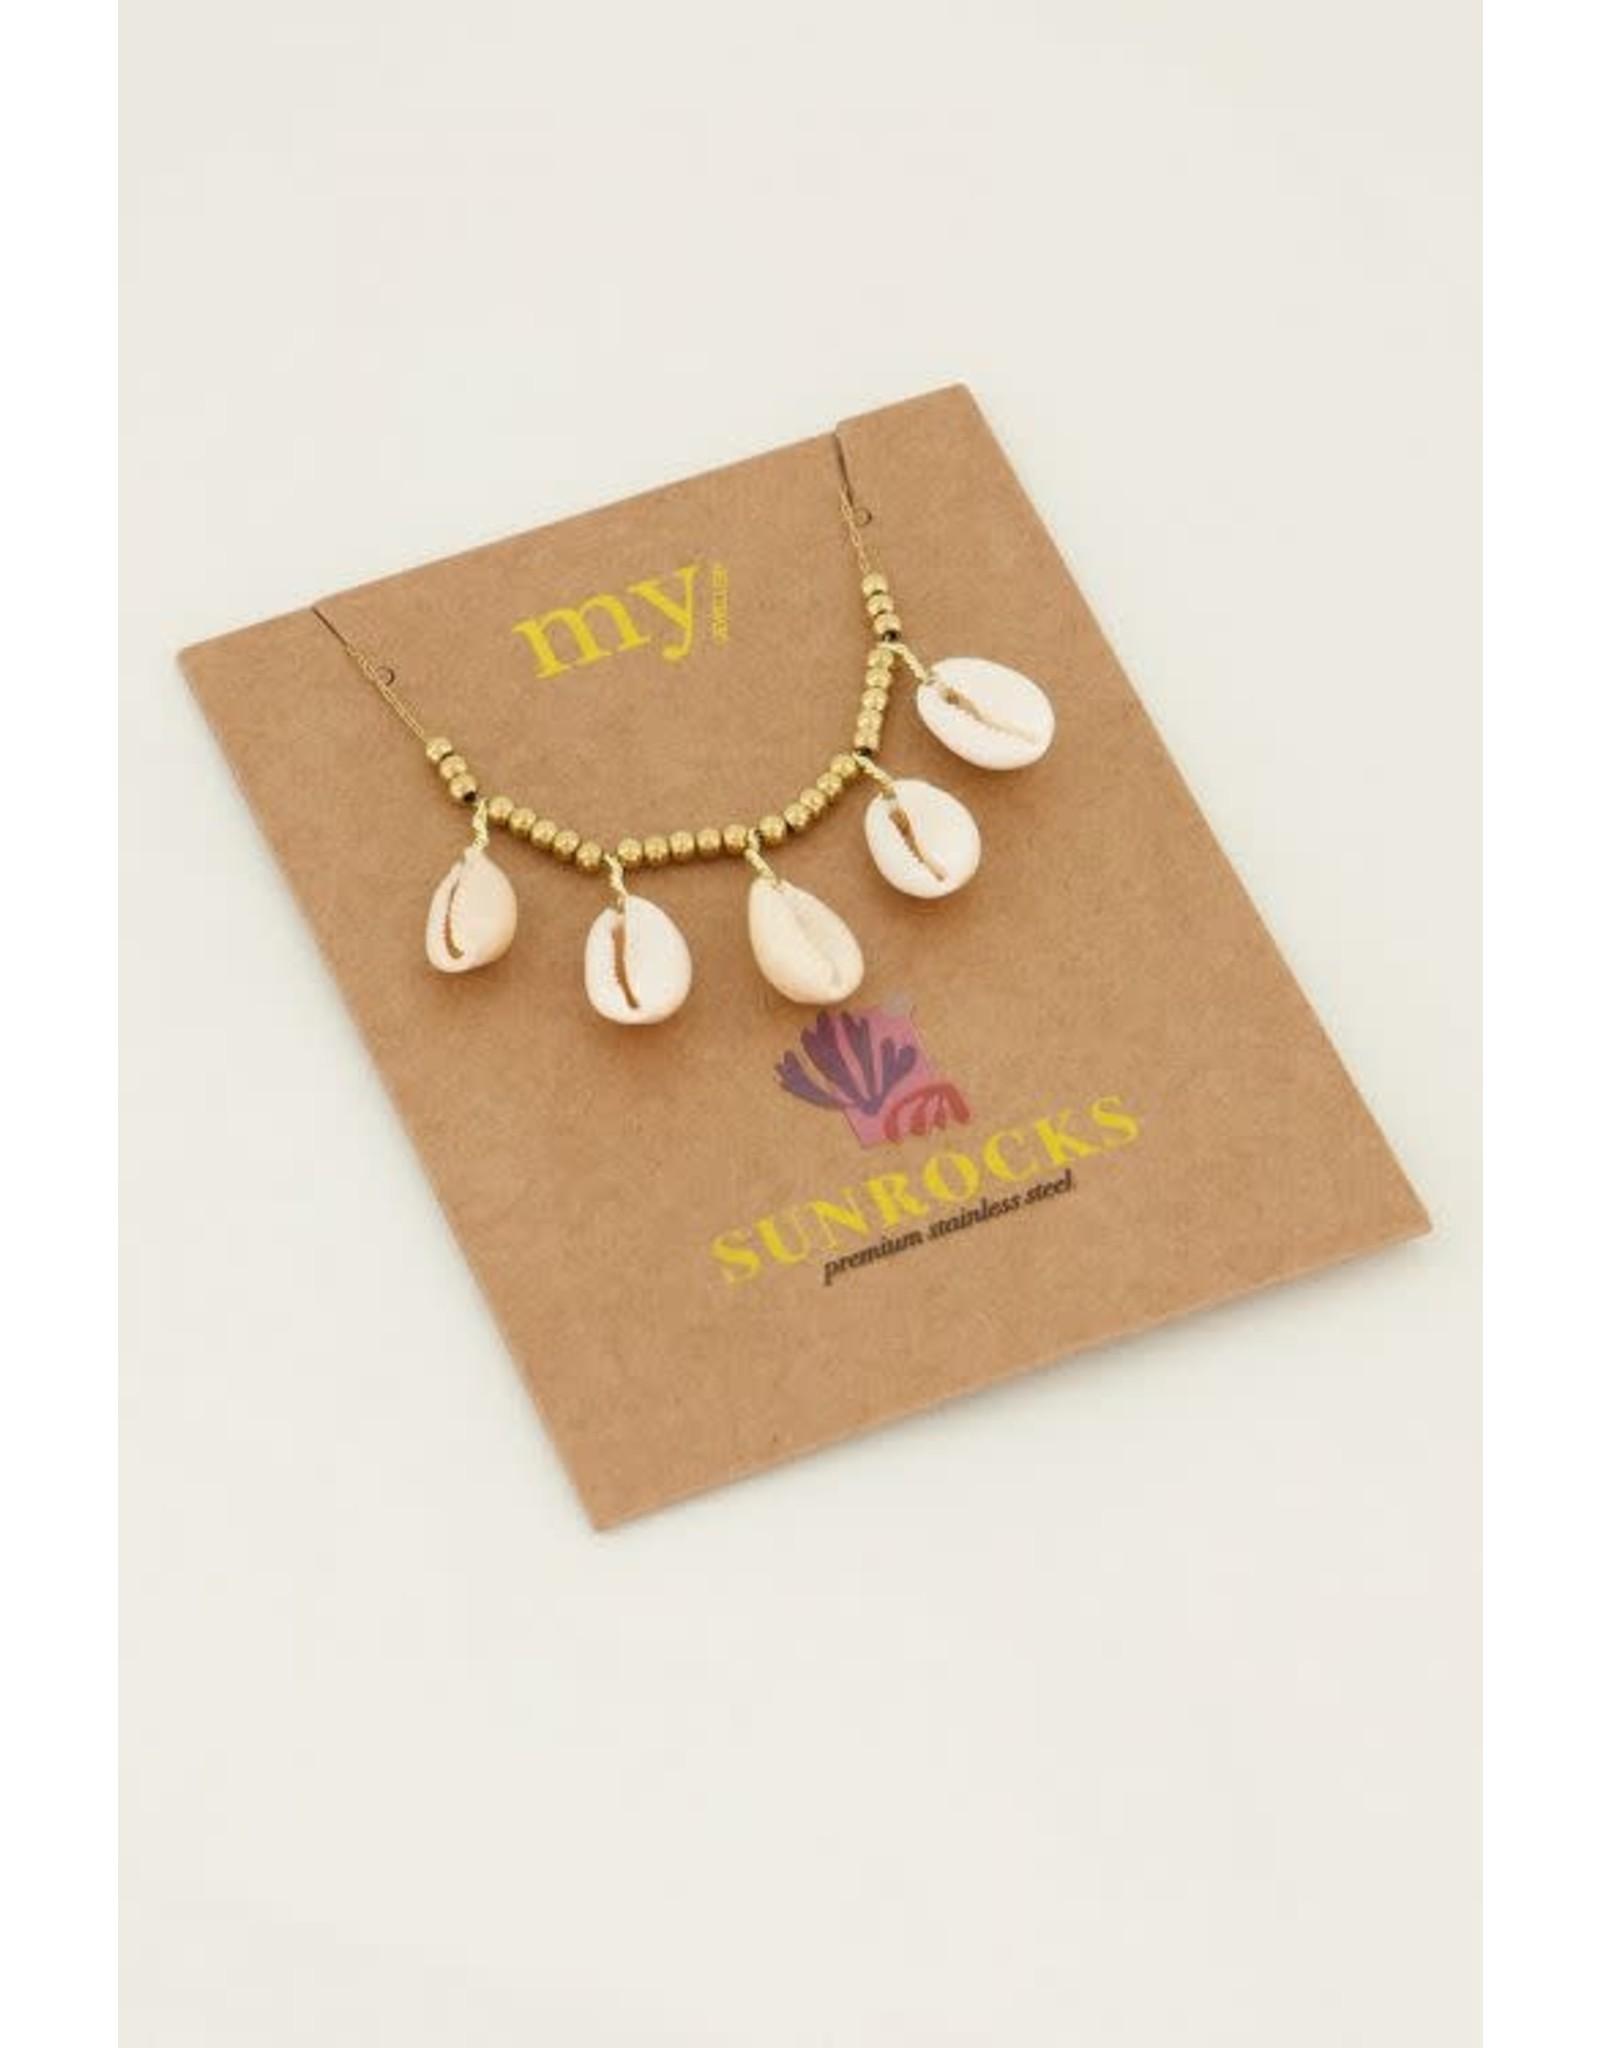 My Jewellery My Jewellery ketting schelpen